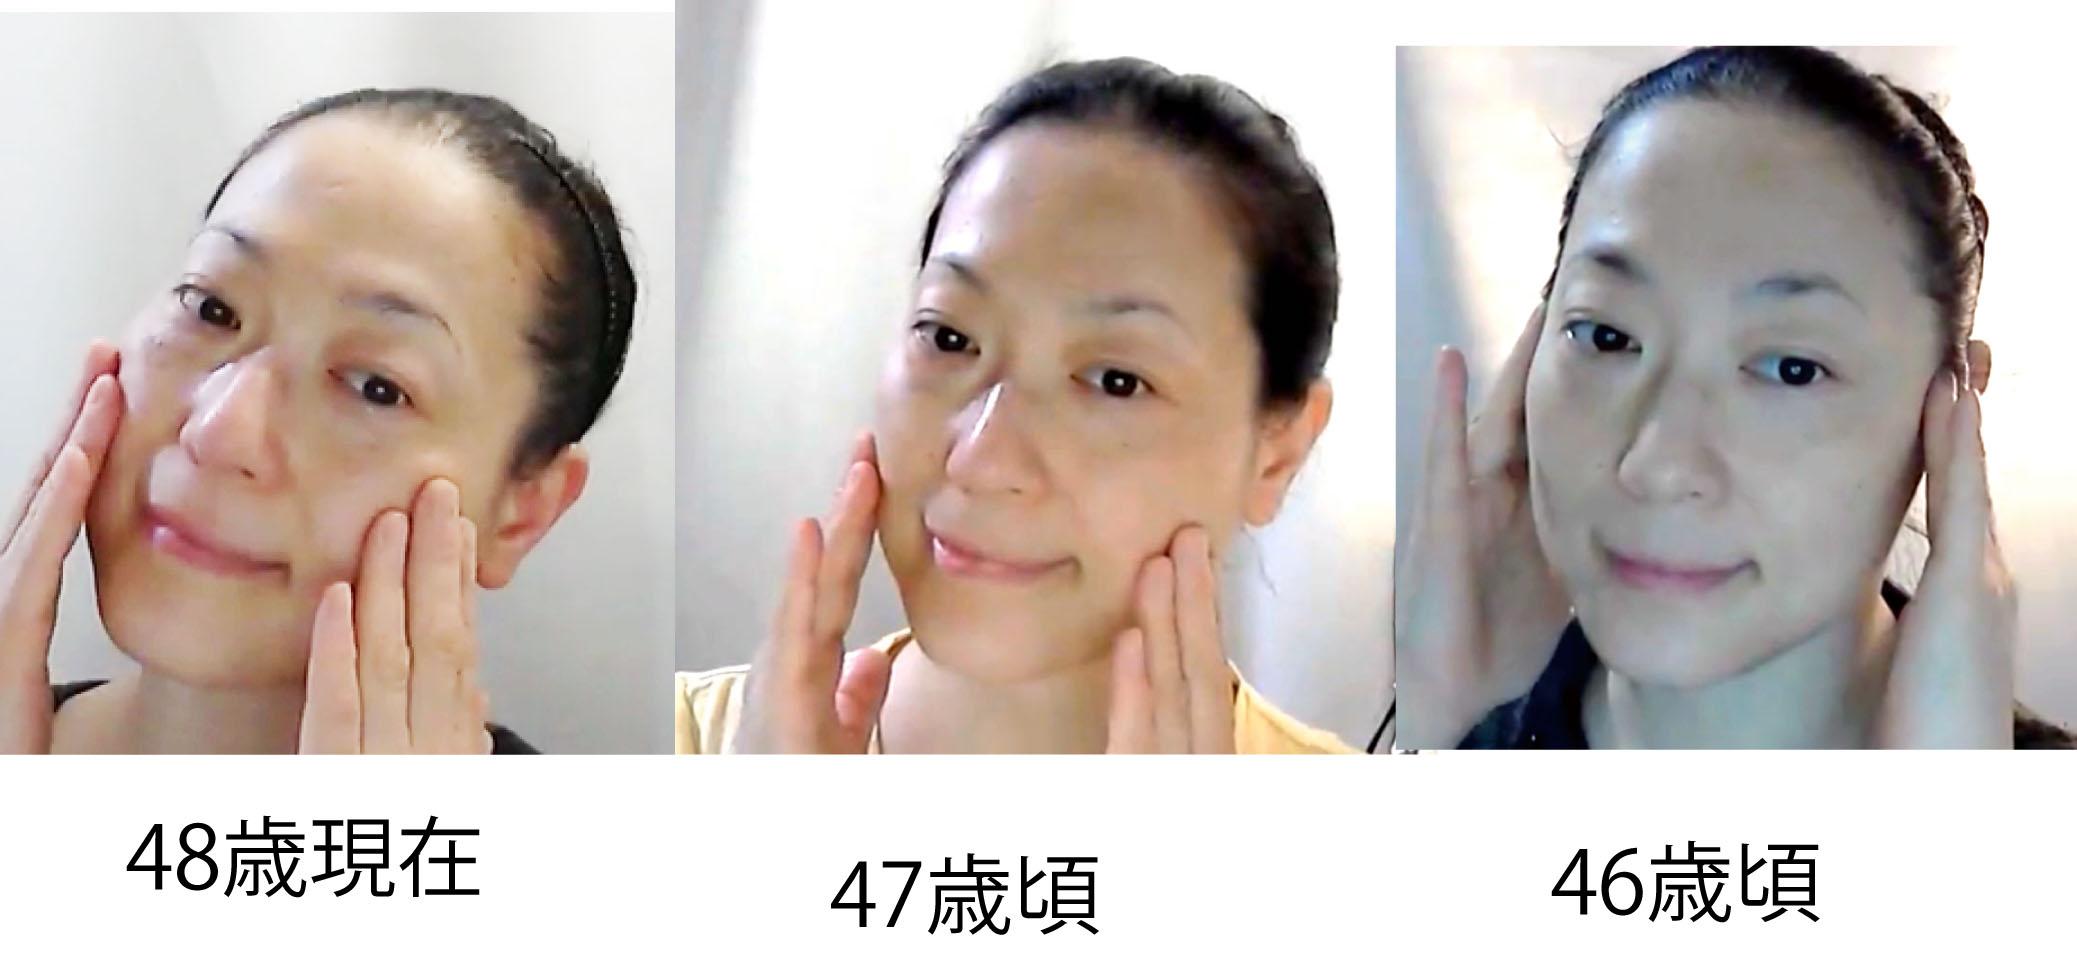 46〜48歳